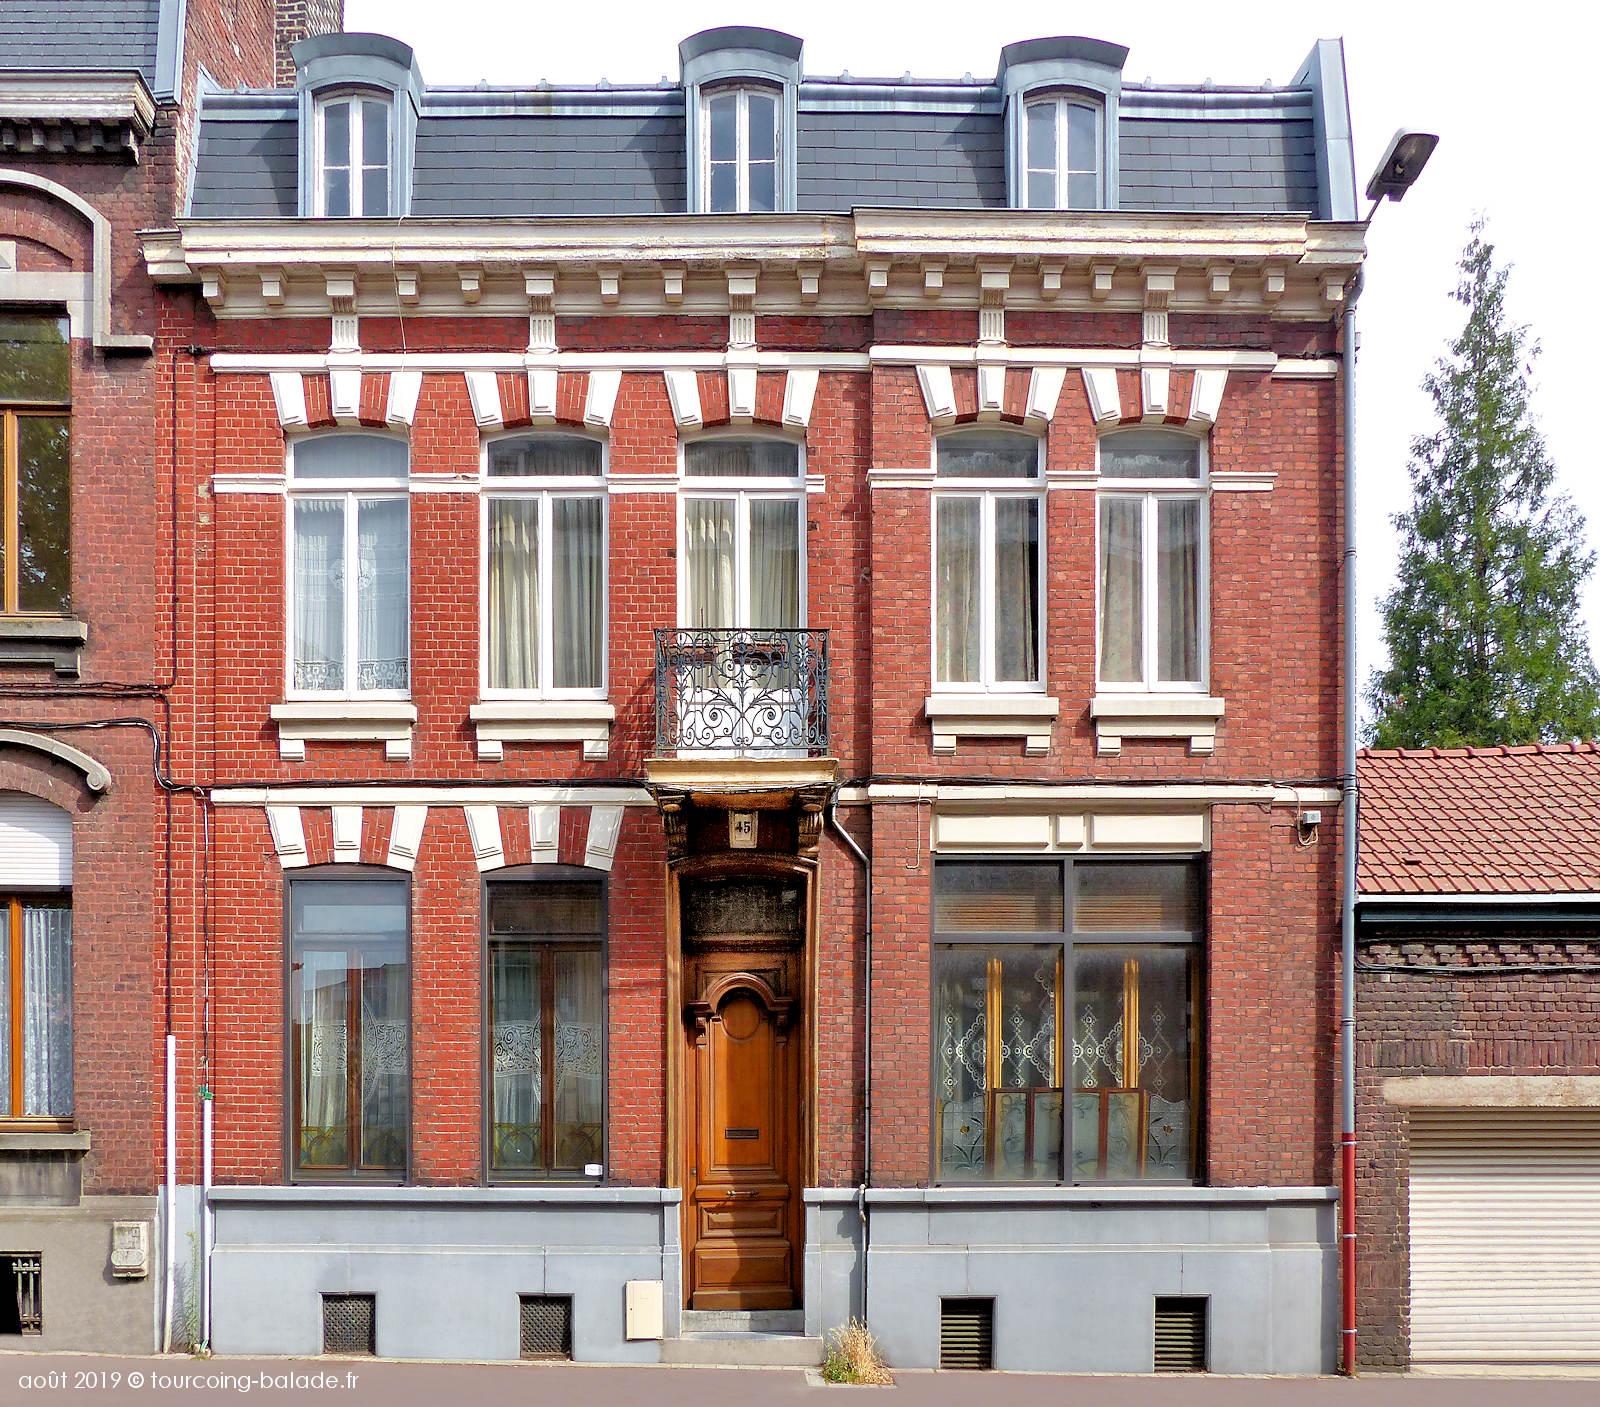 Maison de maître, rue Chanzy, Tourcoing 2019